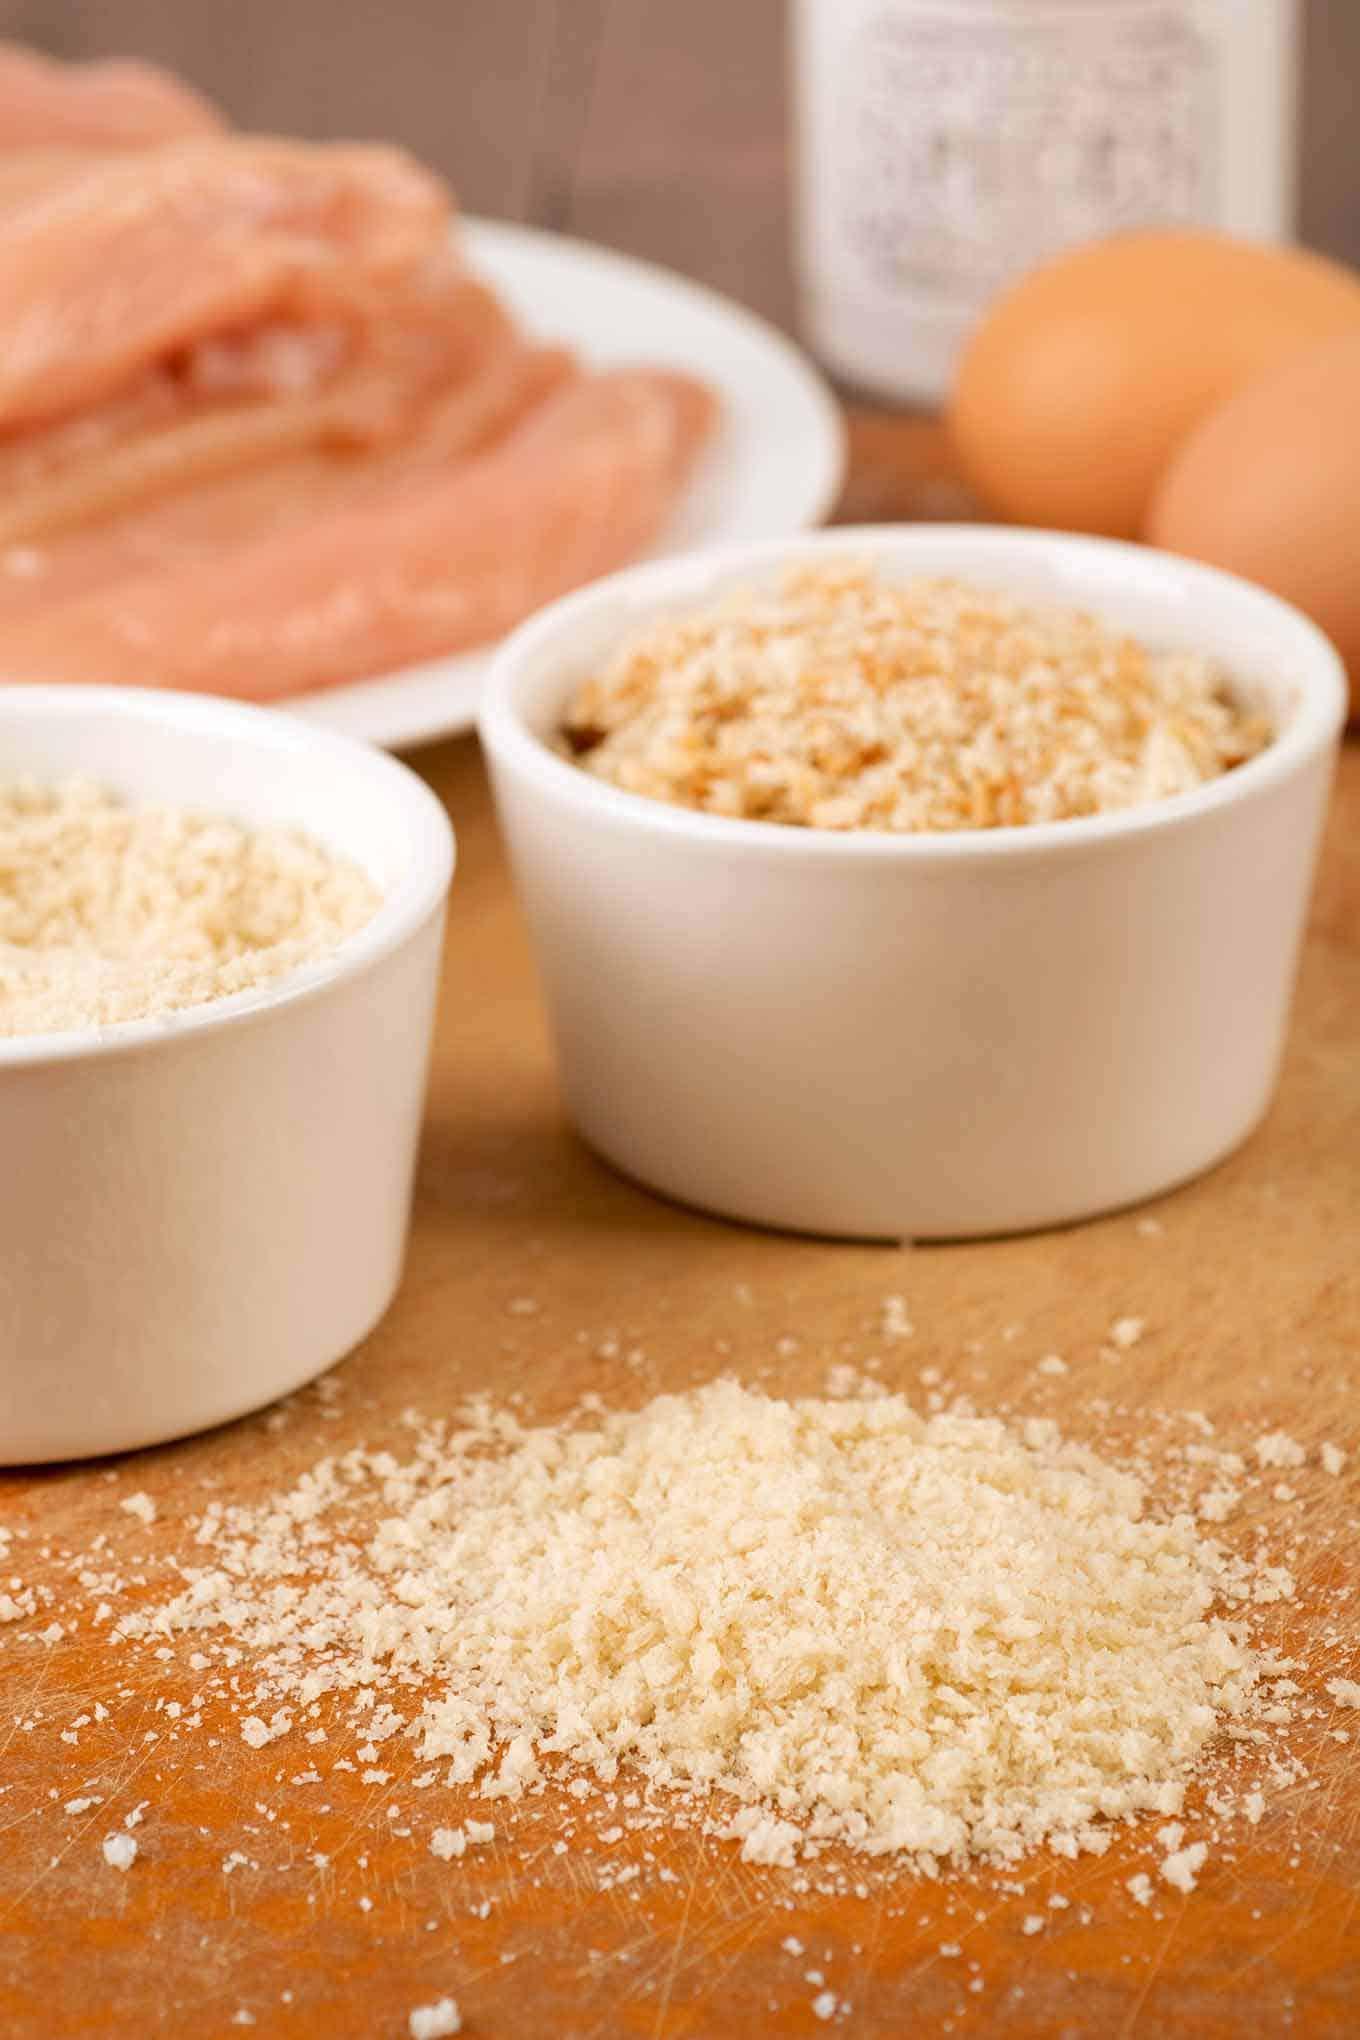 The Best Gluten-Free Substitutions: Breadcrumbs